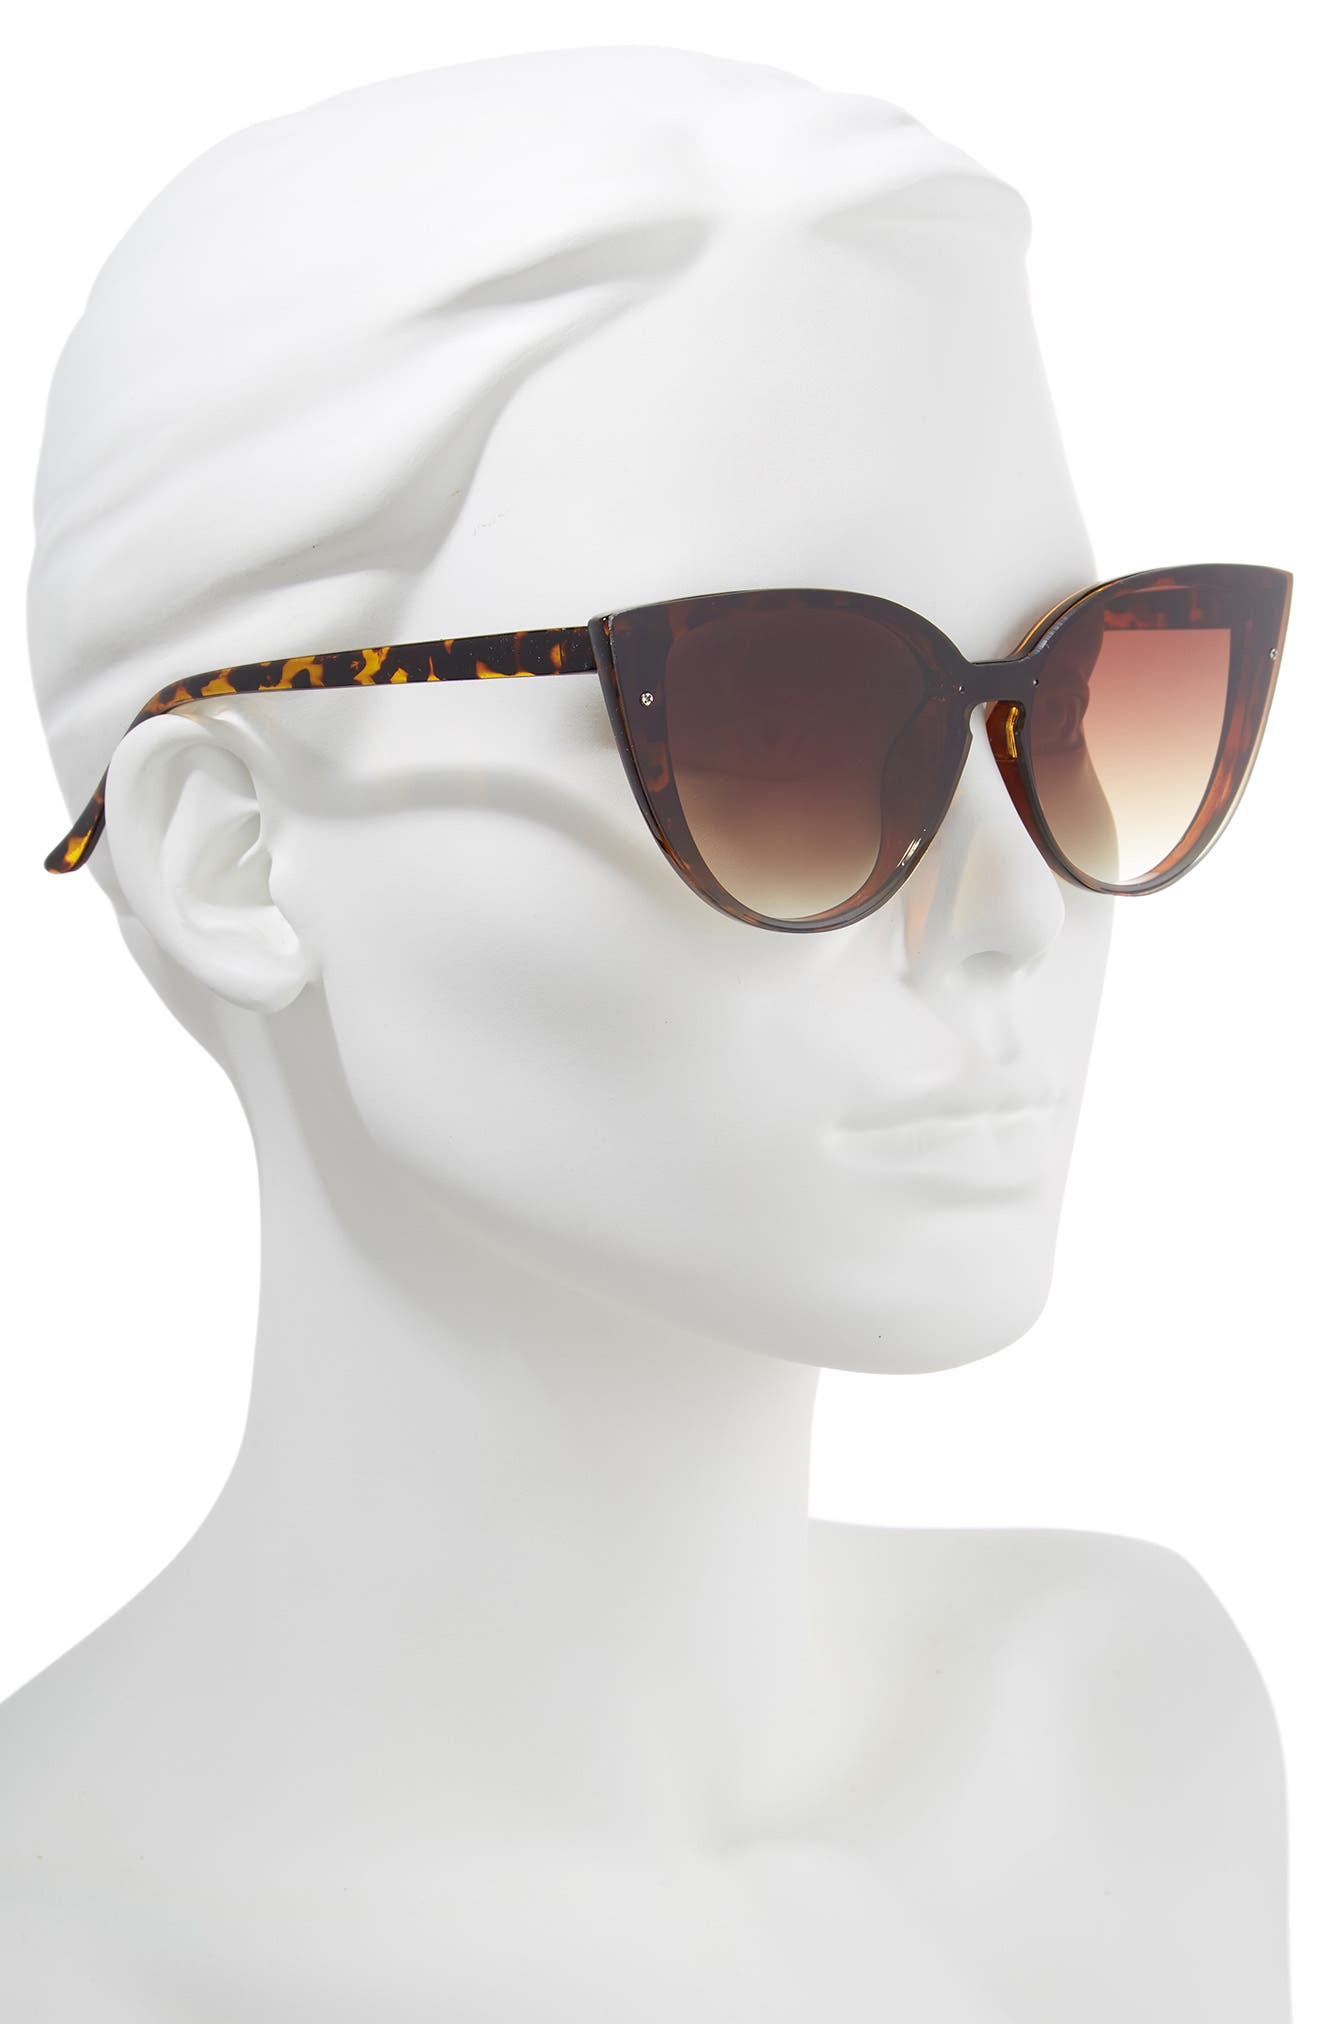 52mm Flat Cat Eye Sunglasses,                             Alternate thumbnail 2, color,                             200